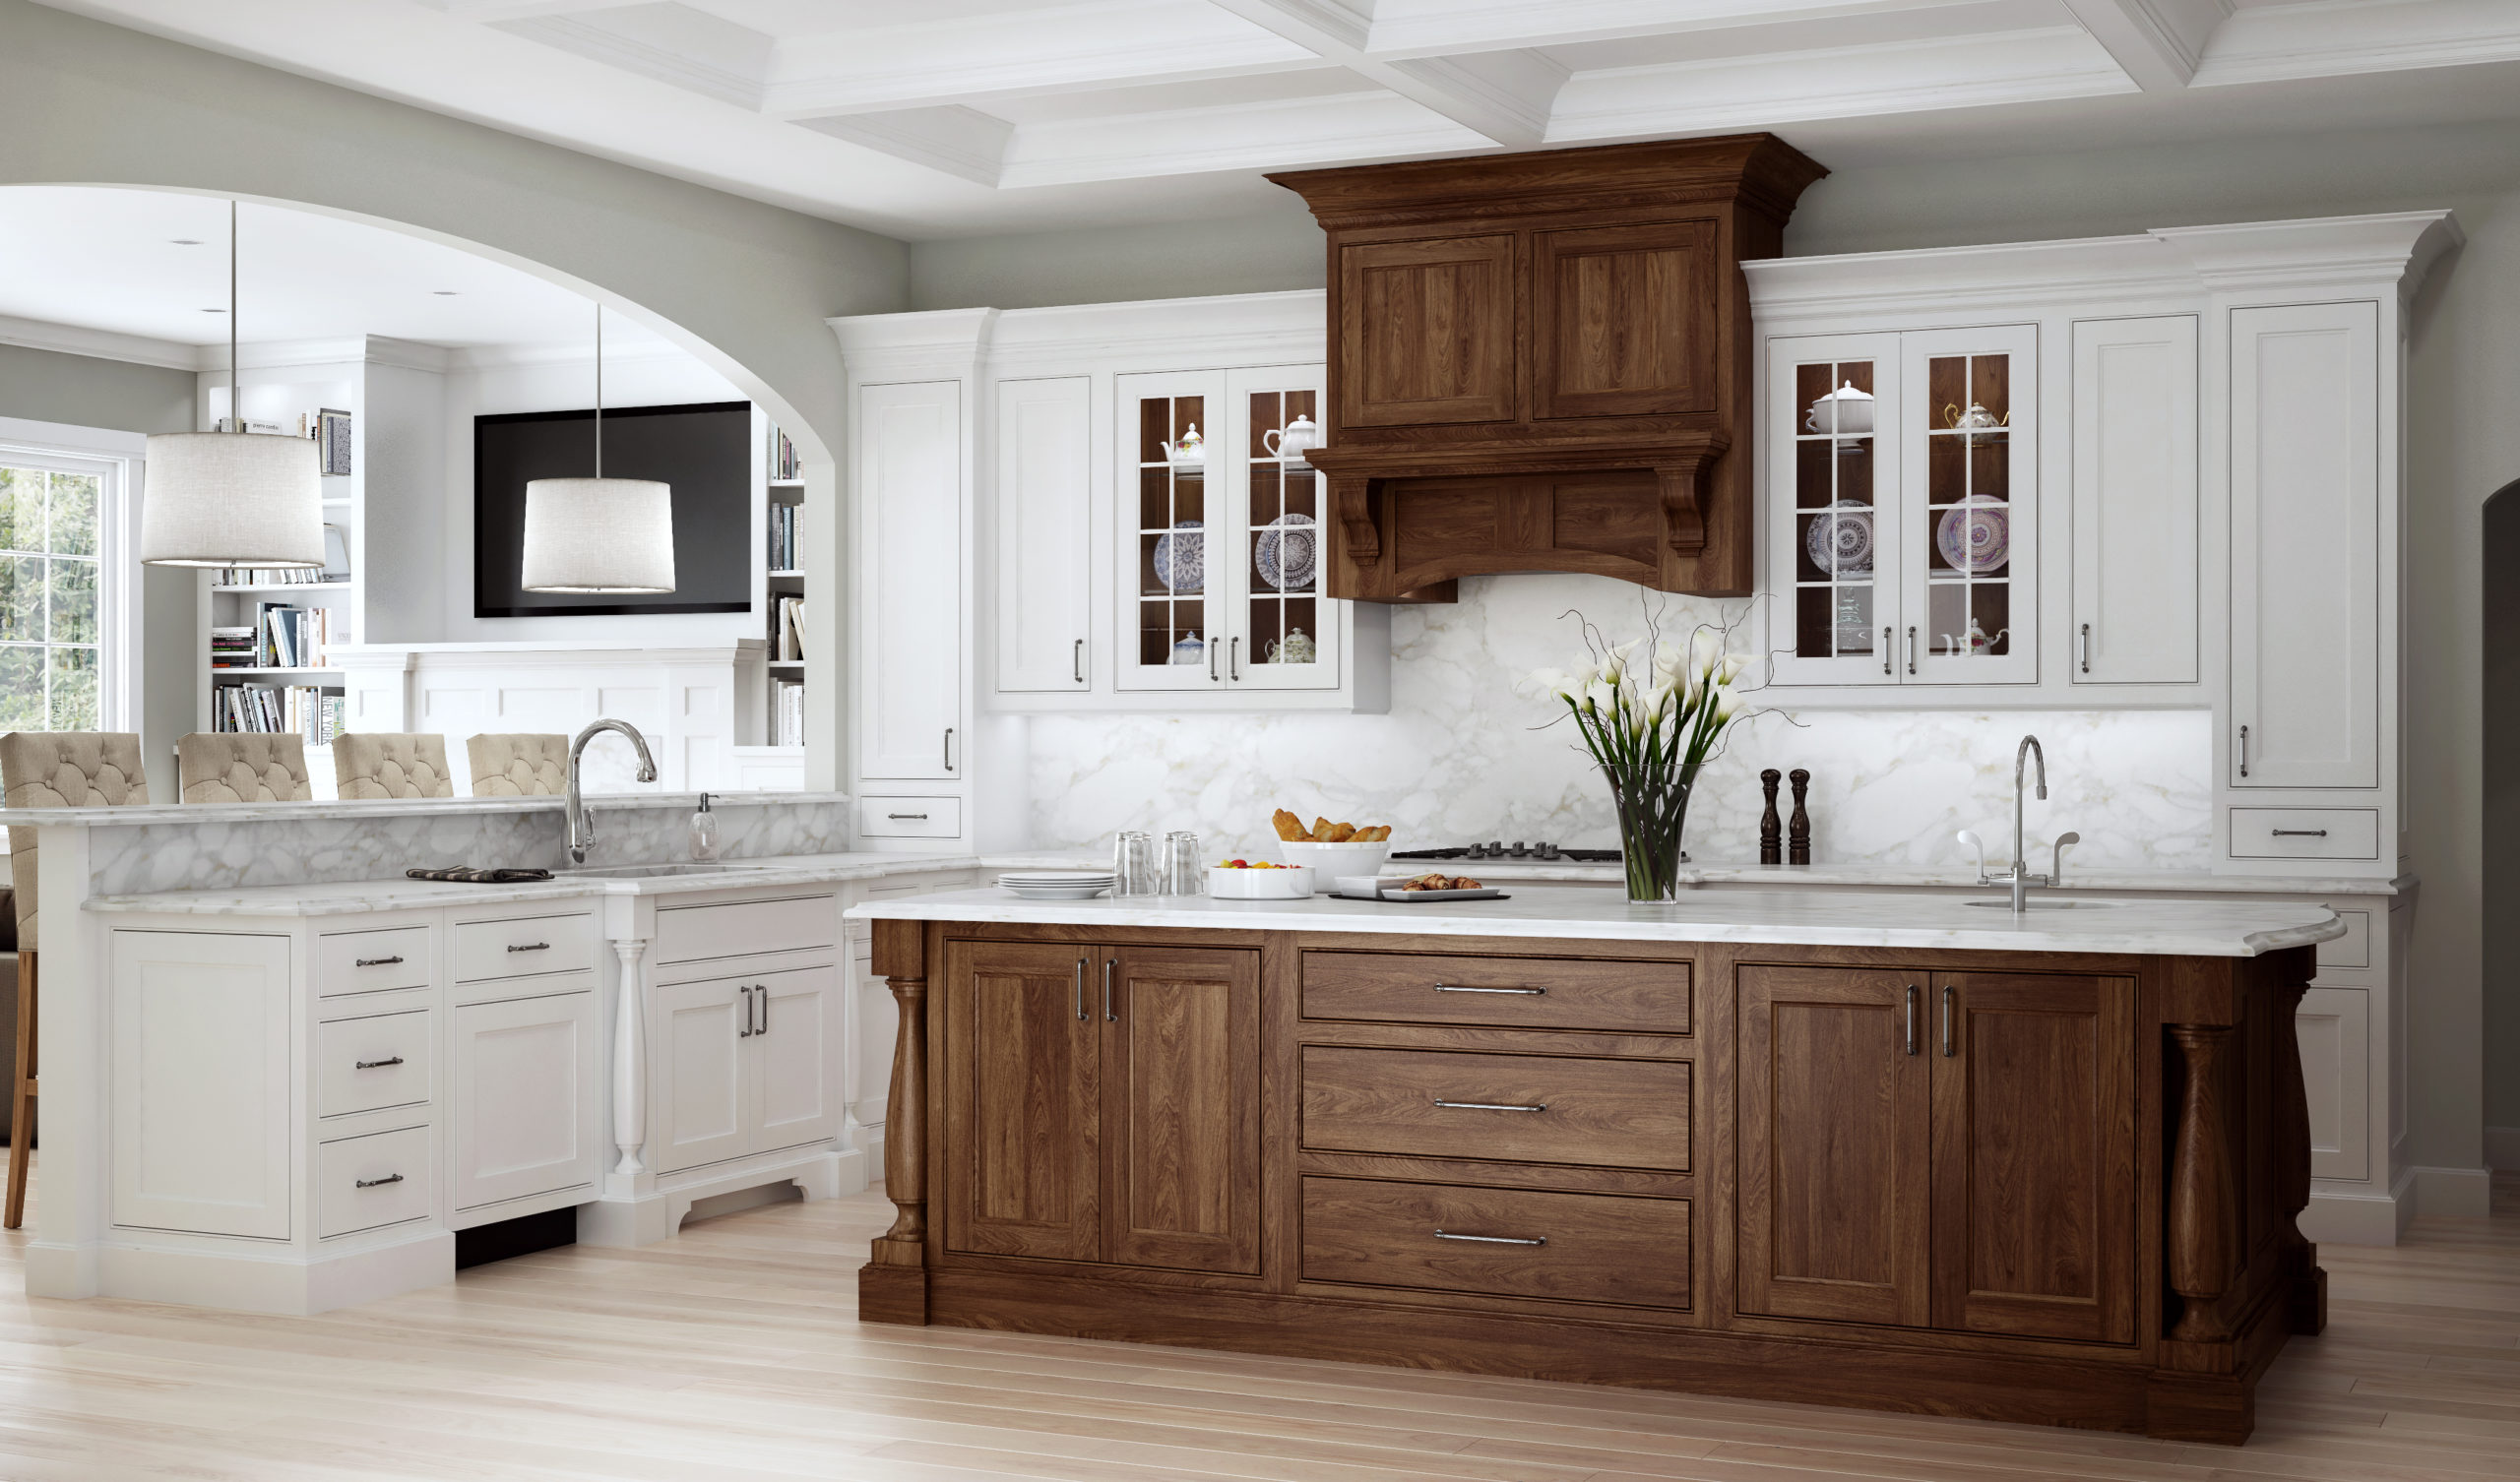 Home Improvement Remodeling   Cary NC Kitchen U0026 Bathroom Renovations